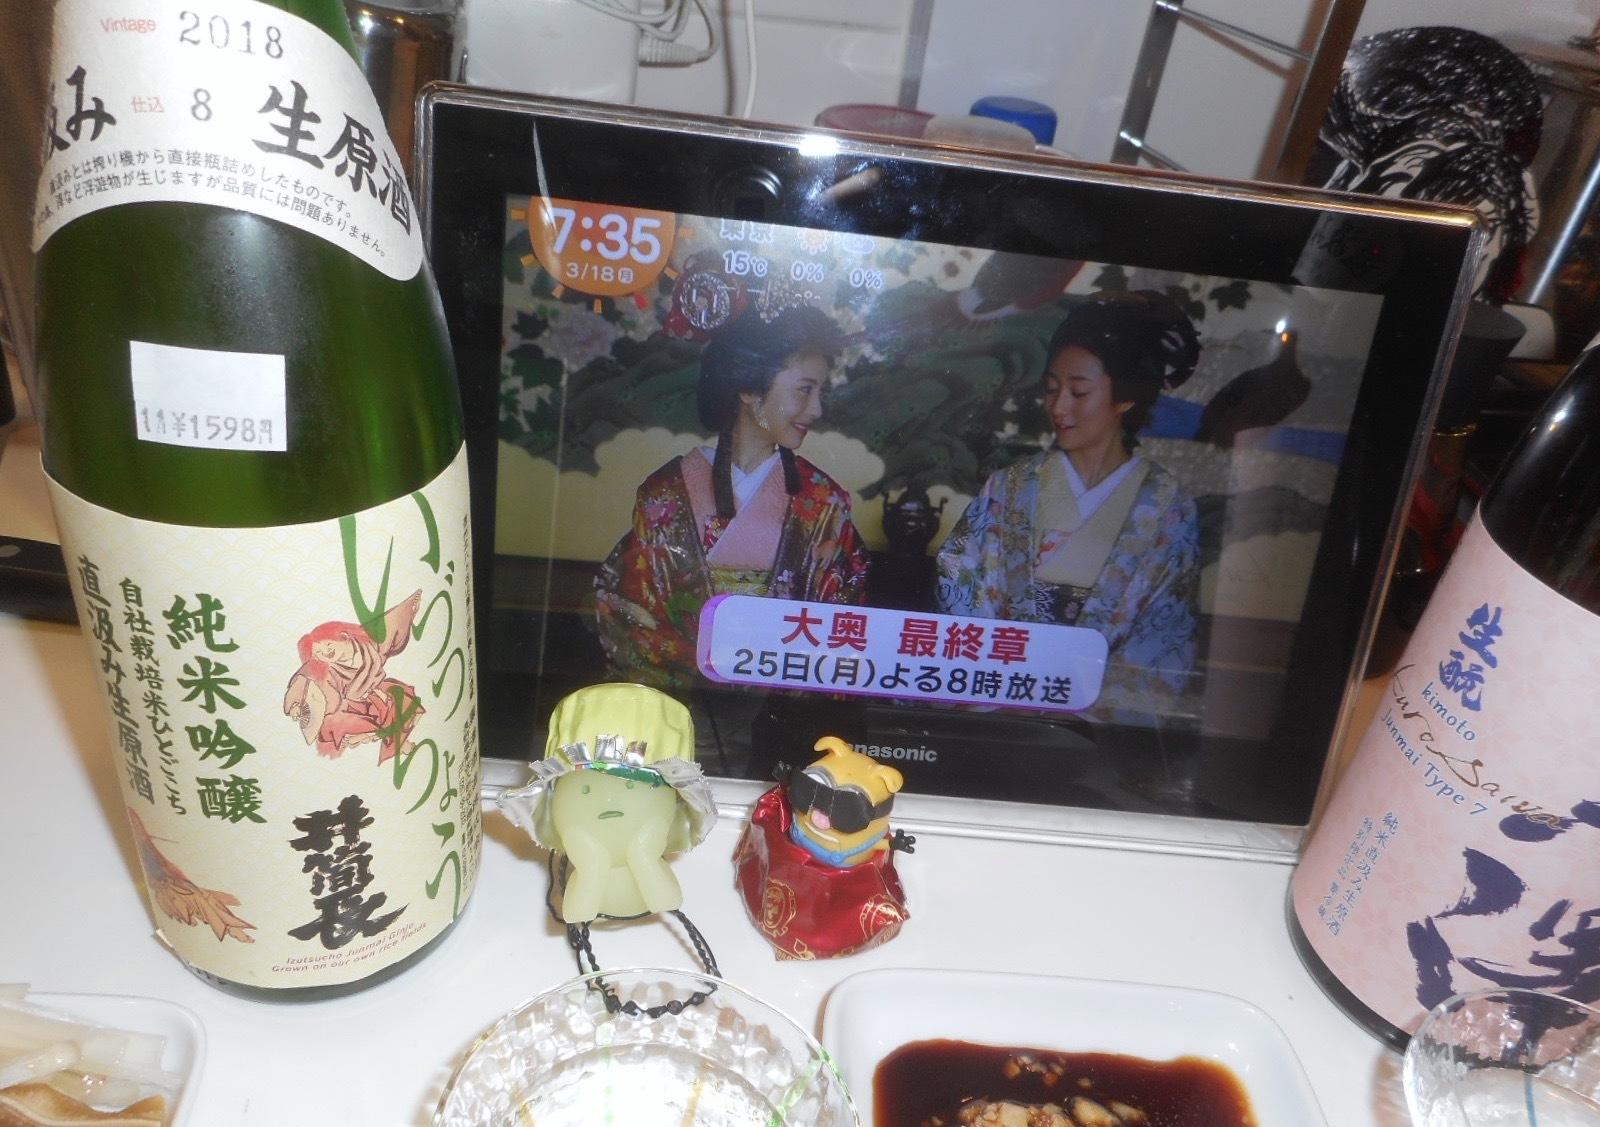 izutsuchou_jikagumi30by2_3.jpg